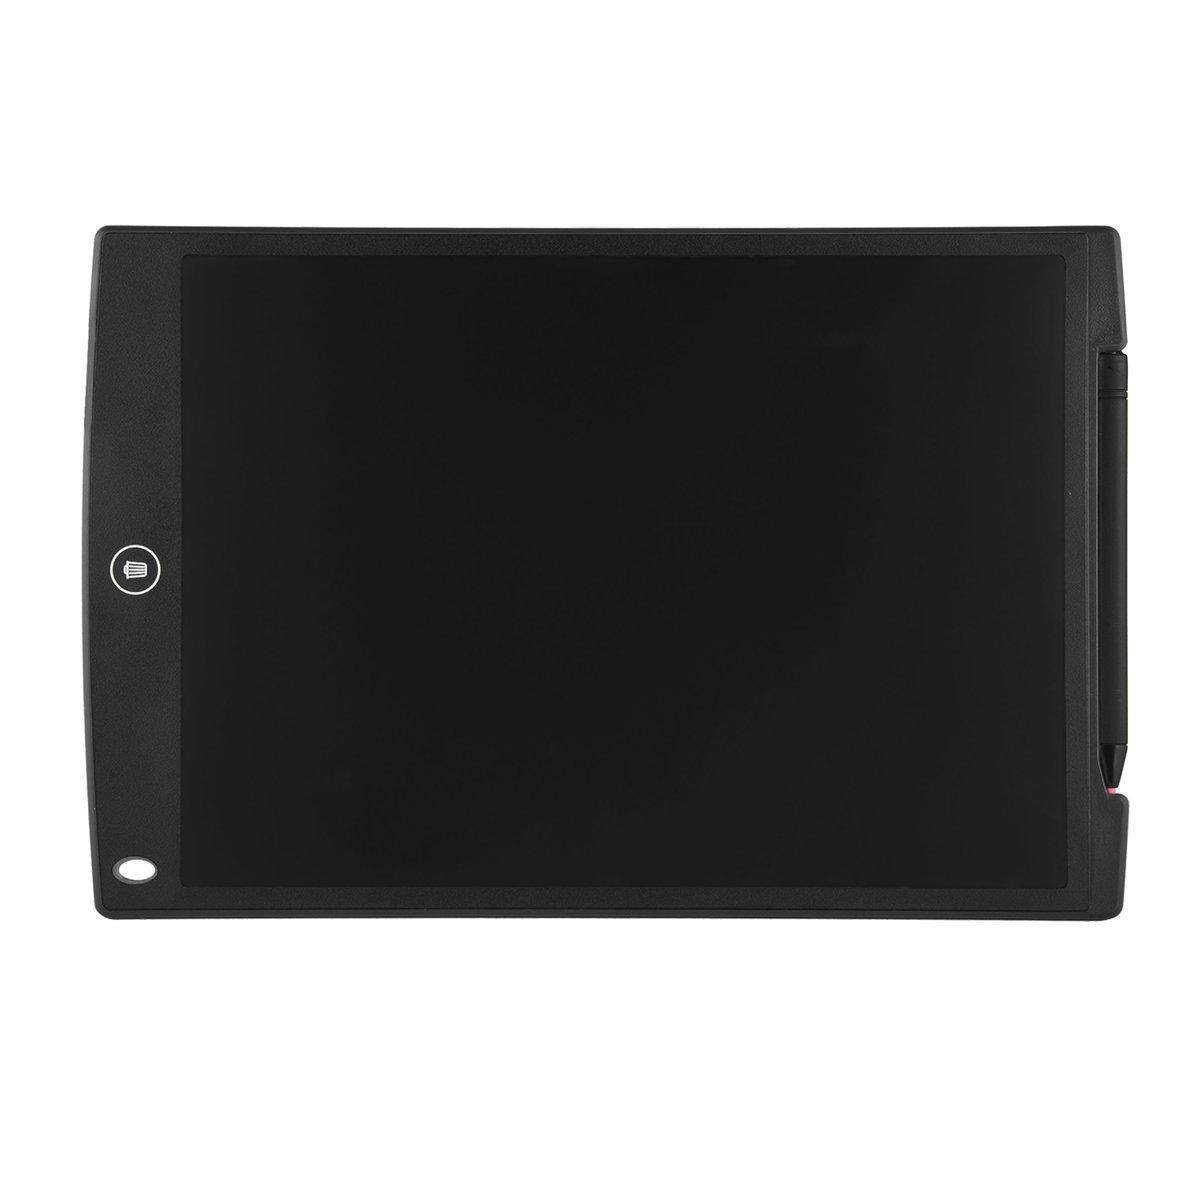 Terbaik Penjual Tahan Lama Ringan Yang Tipis Jas Satu Kancing Menghapus Menghemat Kertas Tablet LCD Tulisan